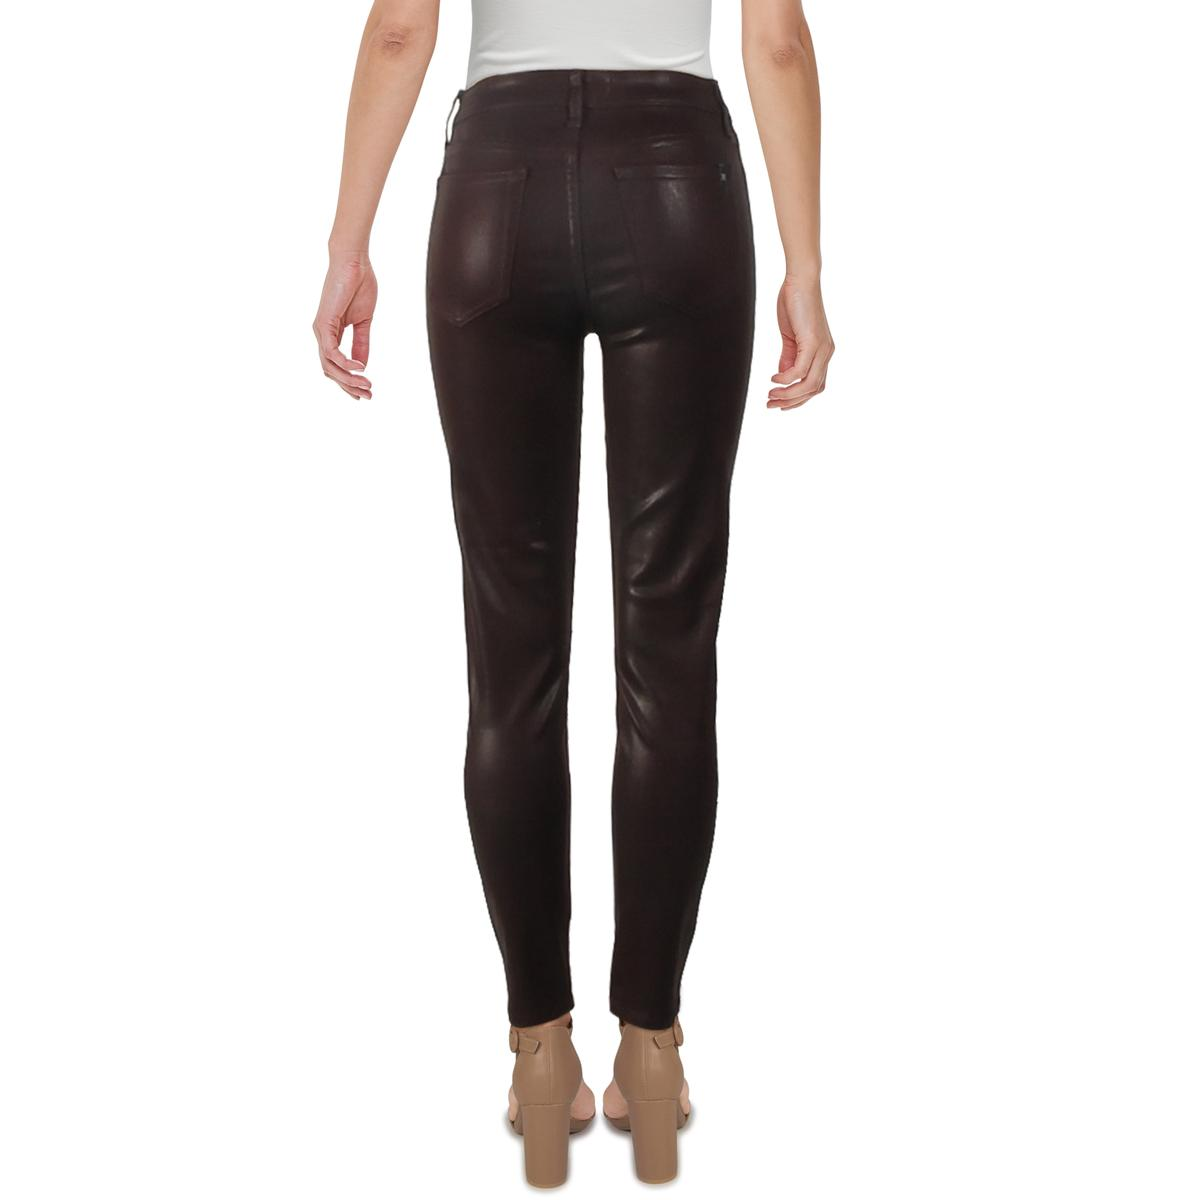 Joe/'s Jeans Womens High Rise Coated Ankle Skinny Jeans BHFO 4807